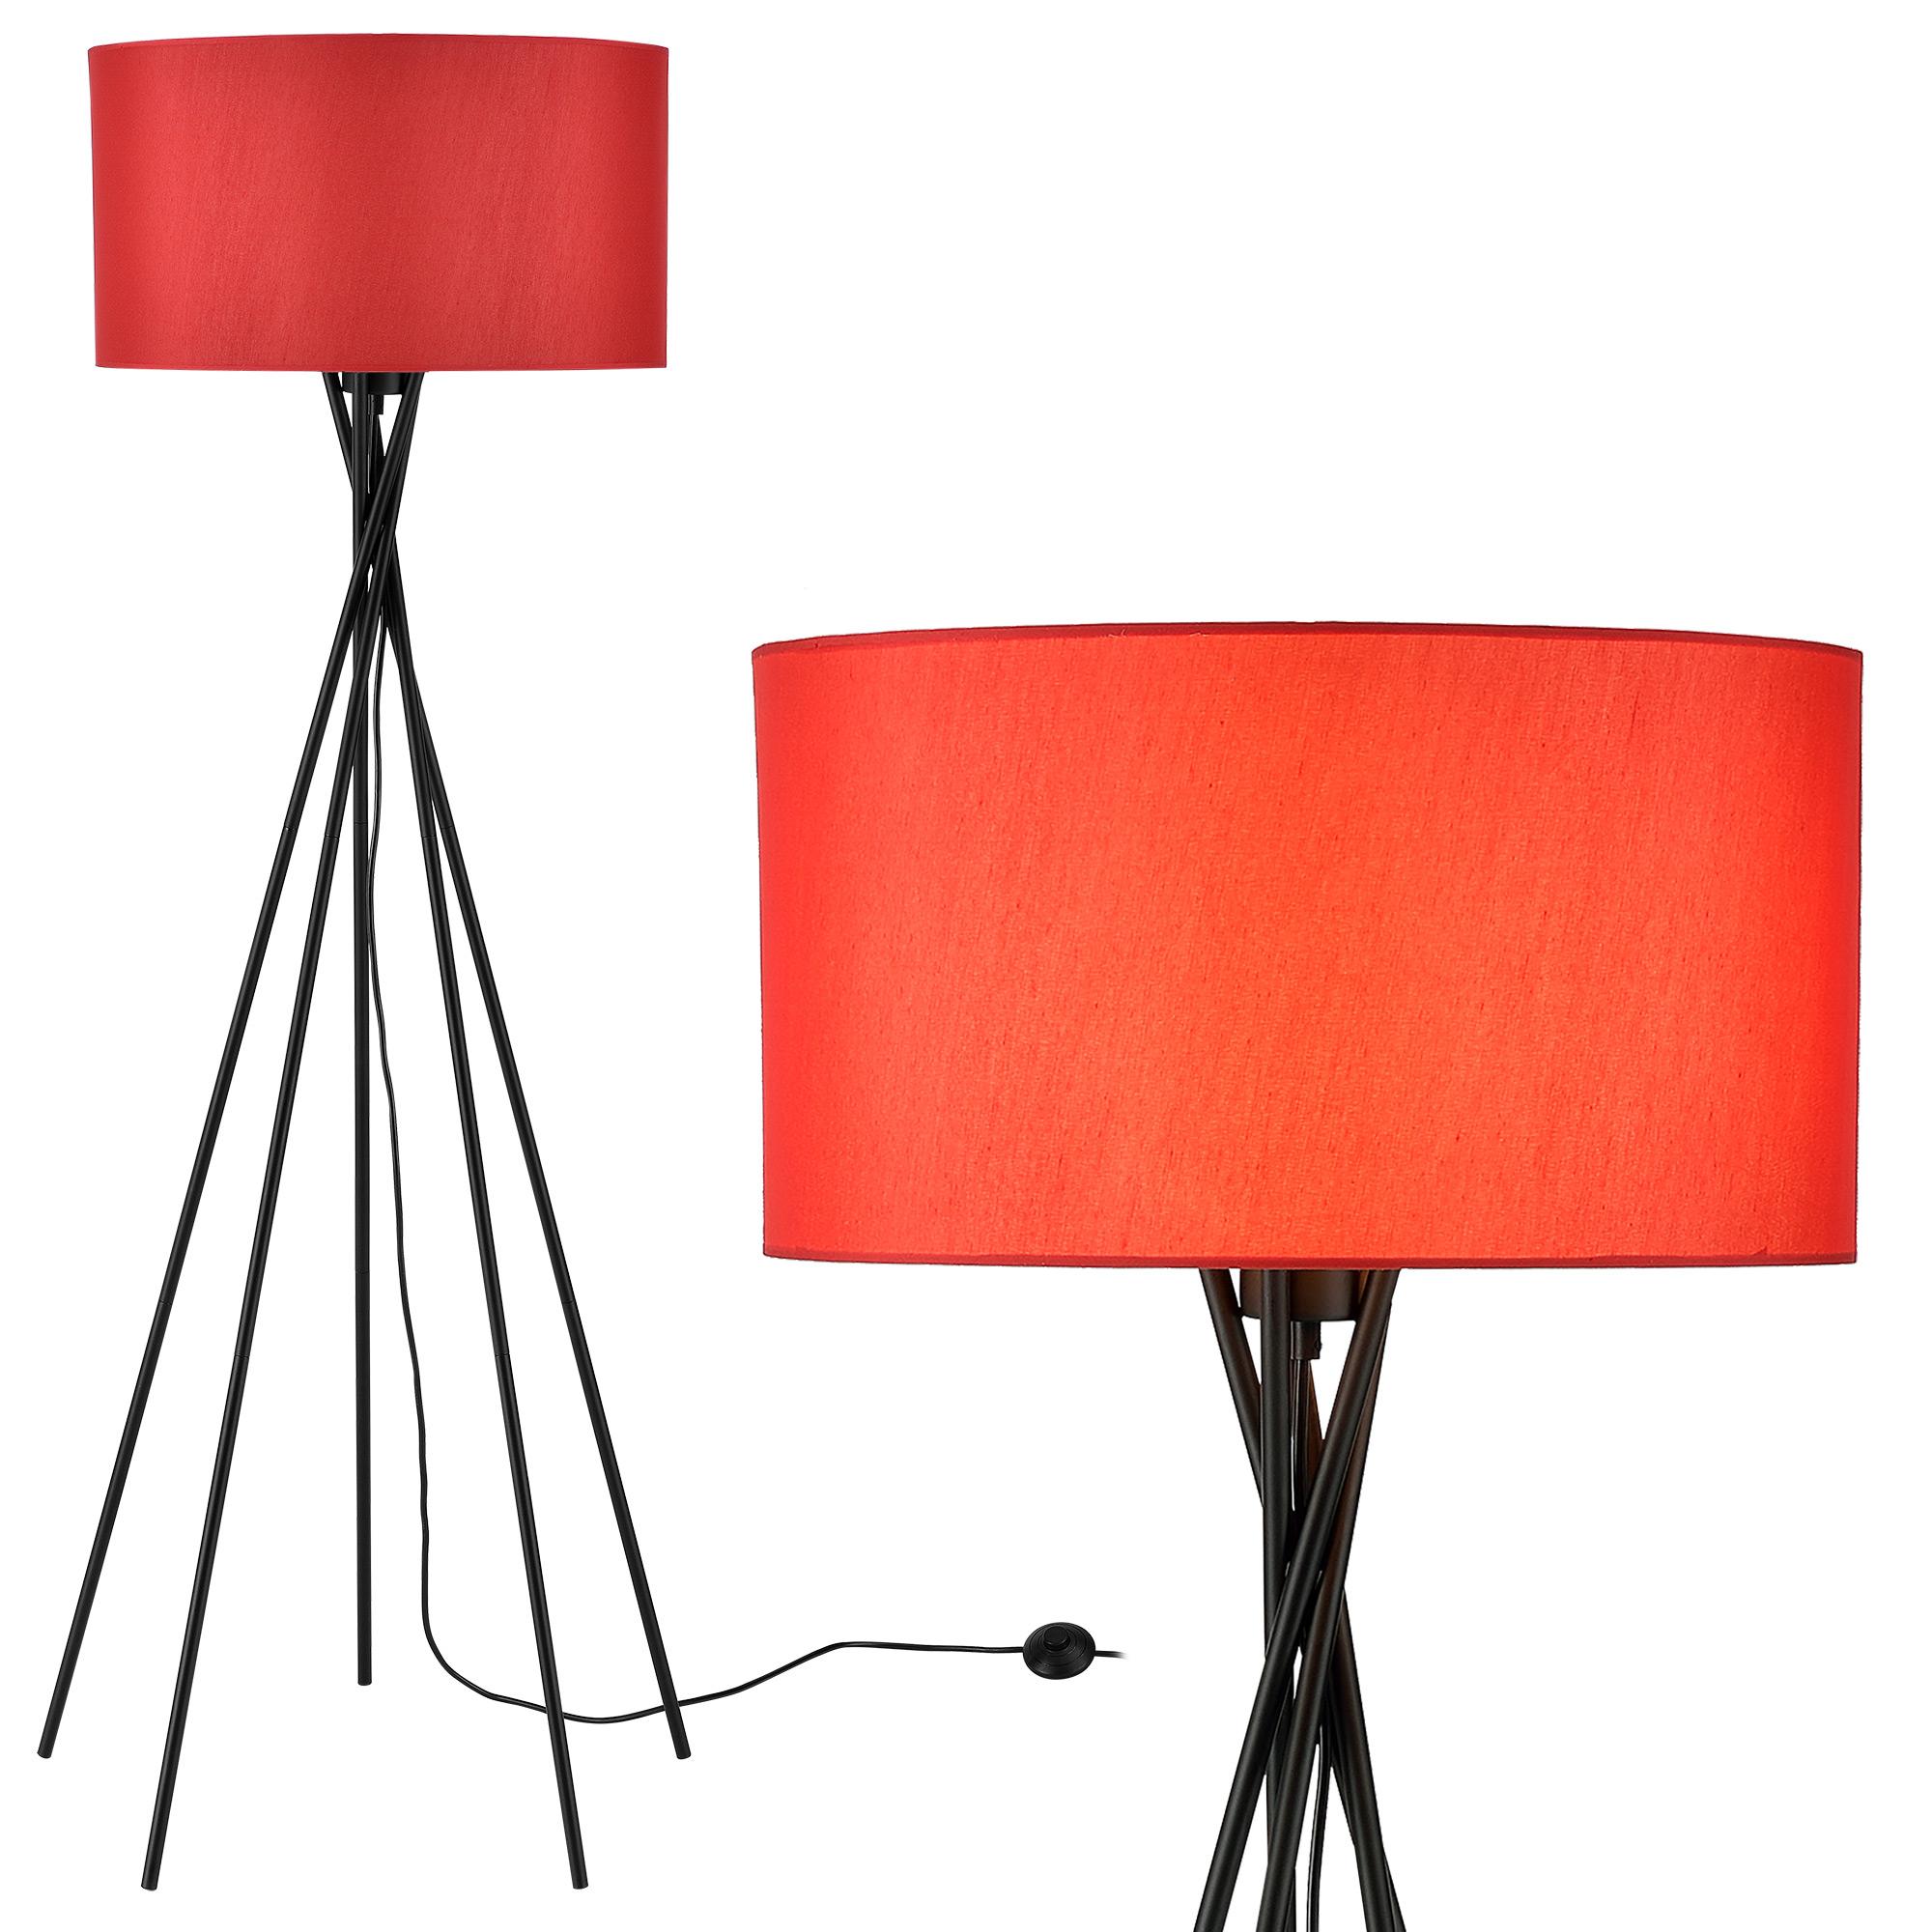 stehleuchte standleuchte stehlampe bodenlampe lampe leuchte ebay. Black Bedroom Furniture Sets. Home Design Ideas